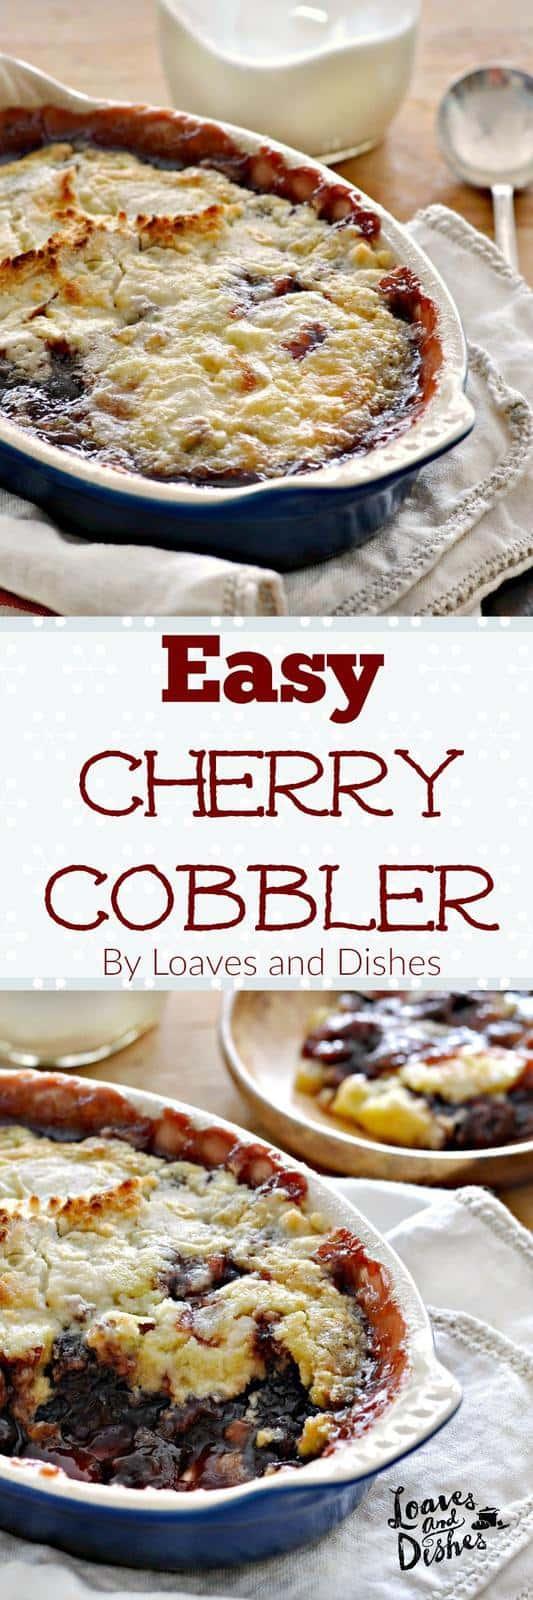 blueberry cobbler blackberry cobbler 2 cherry cobbler copycat recipe ...